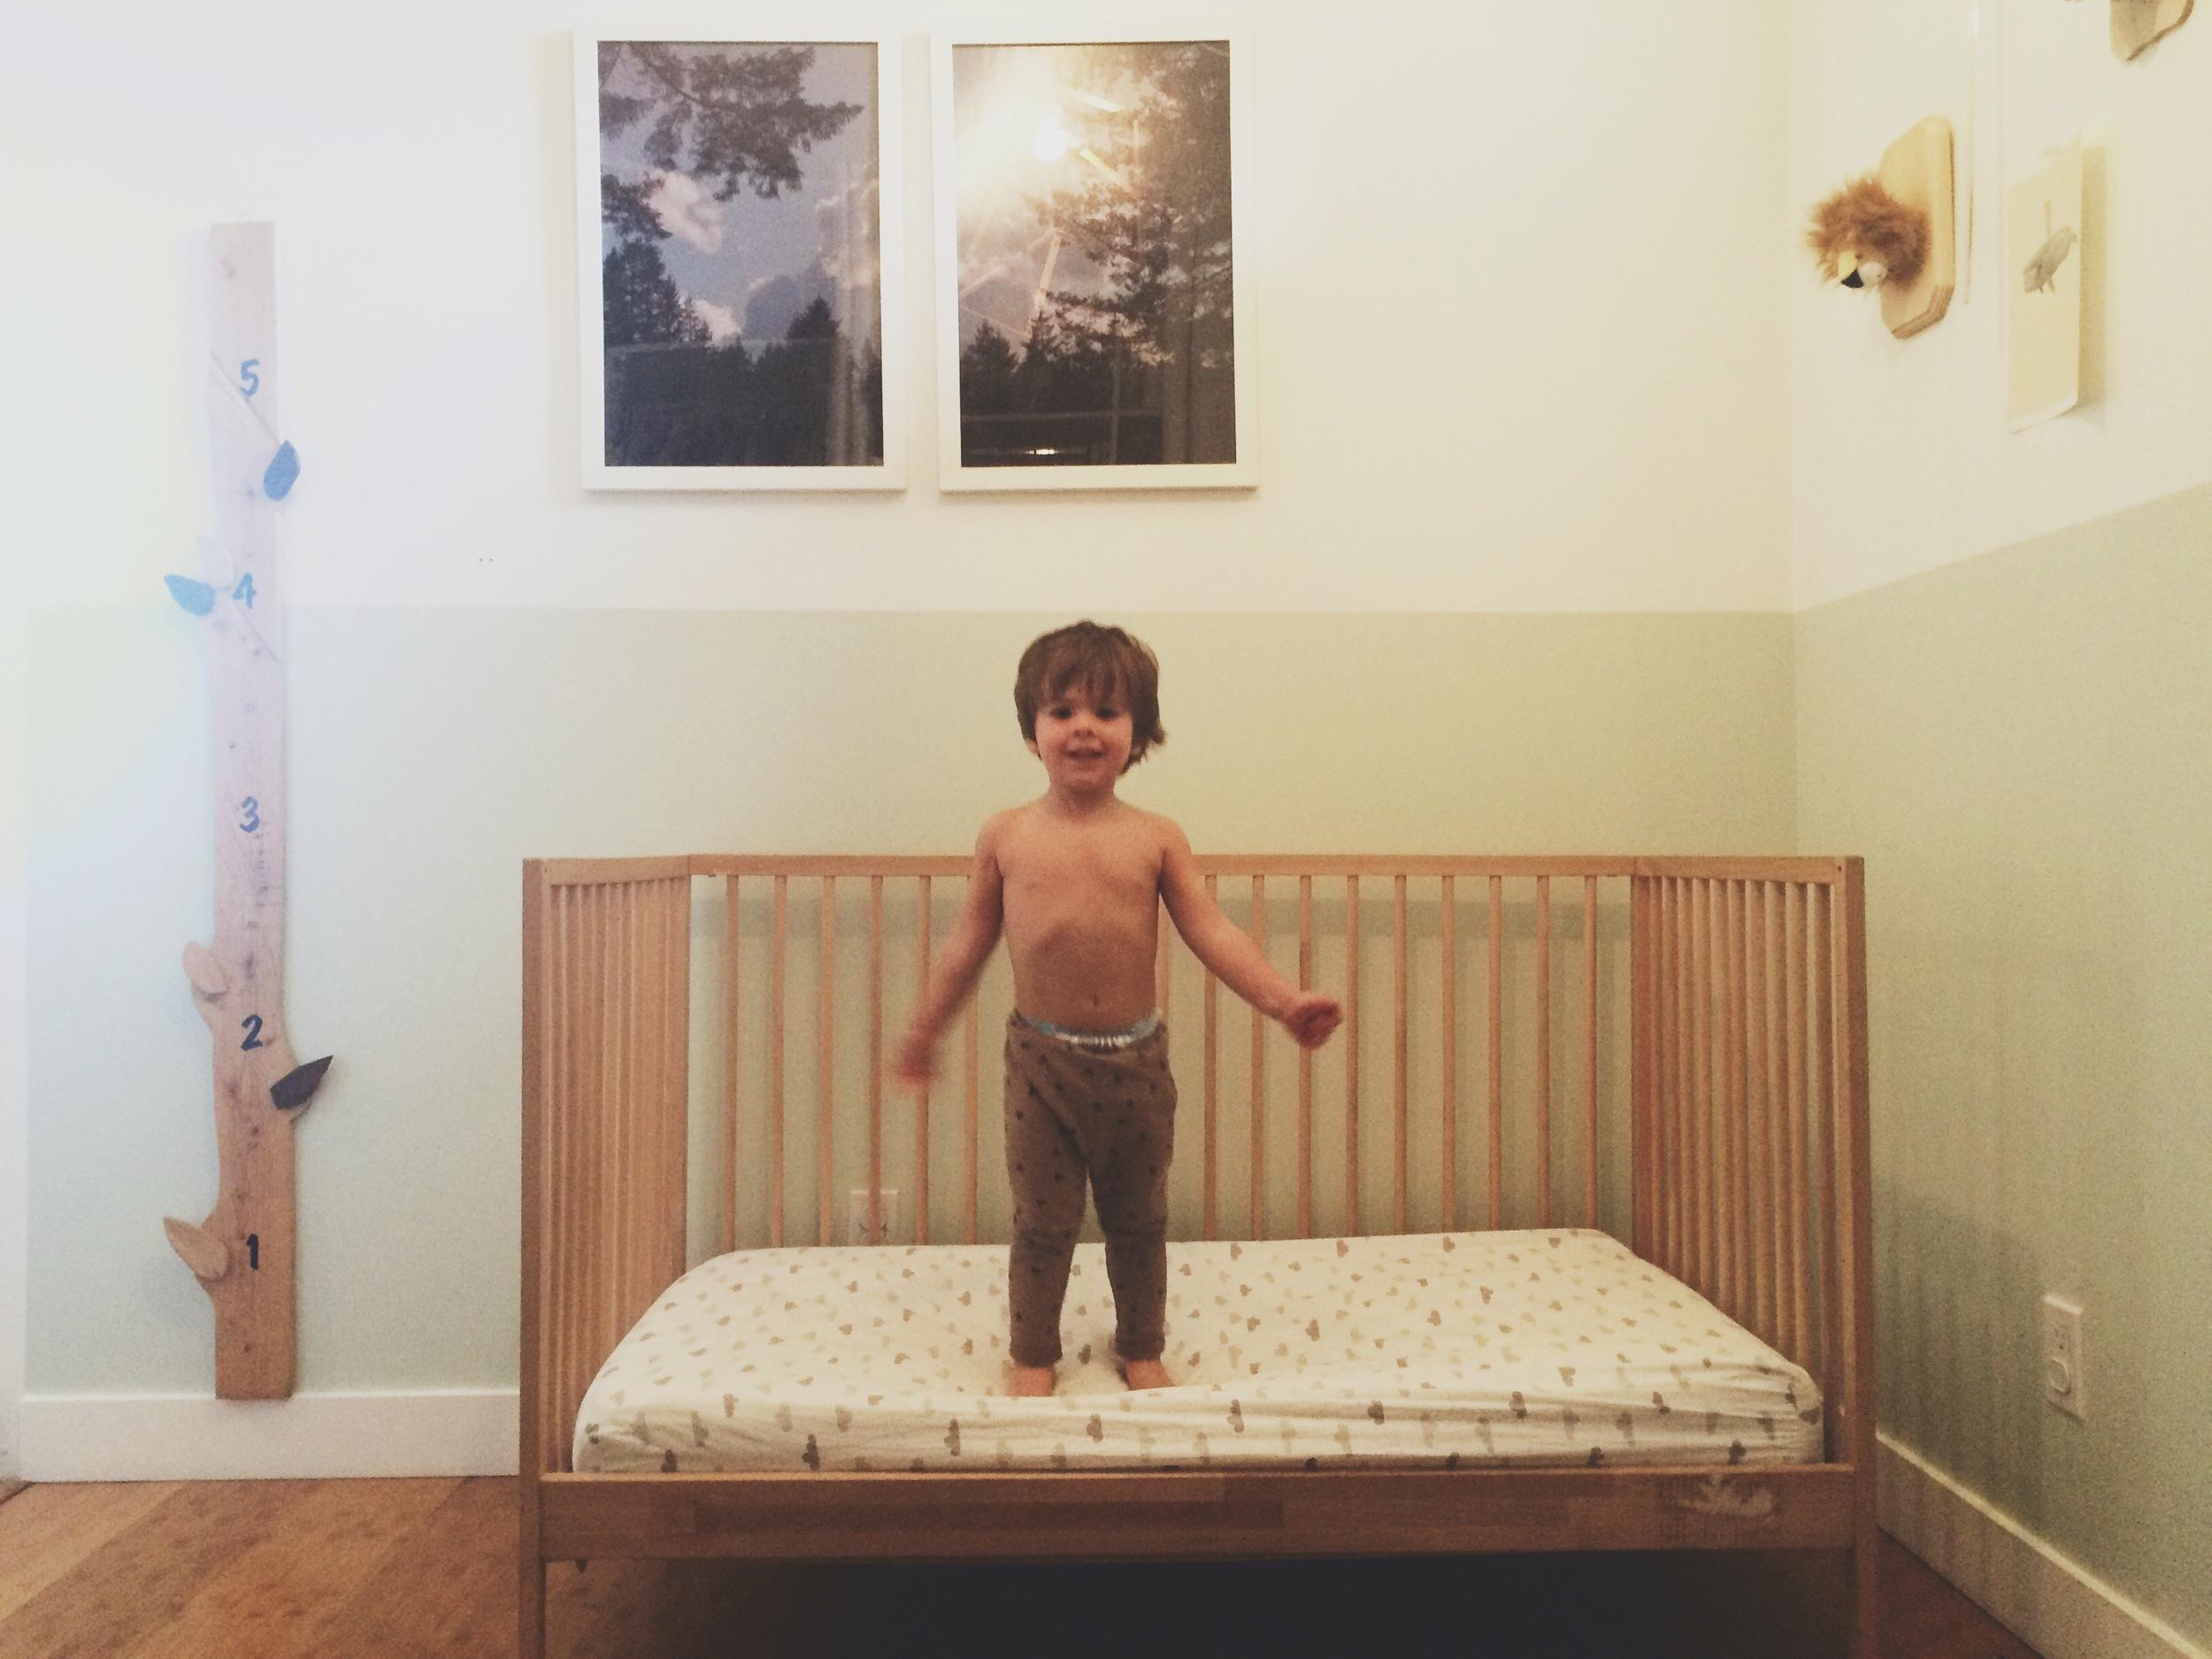 Ikea Sniglar Crib converted to toddler bed